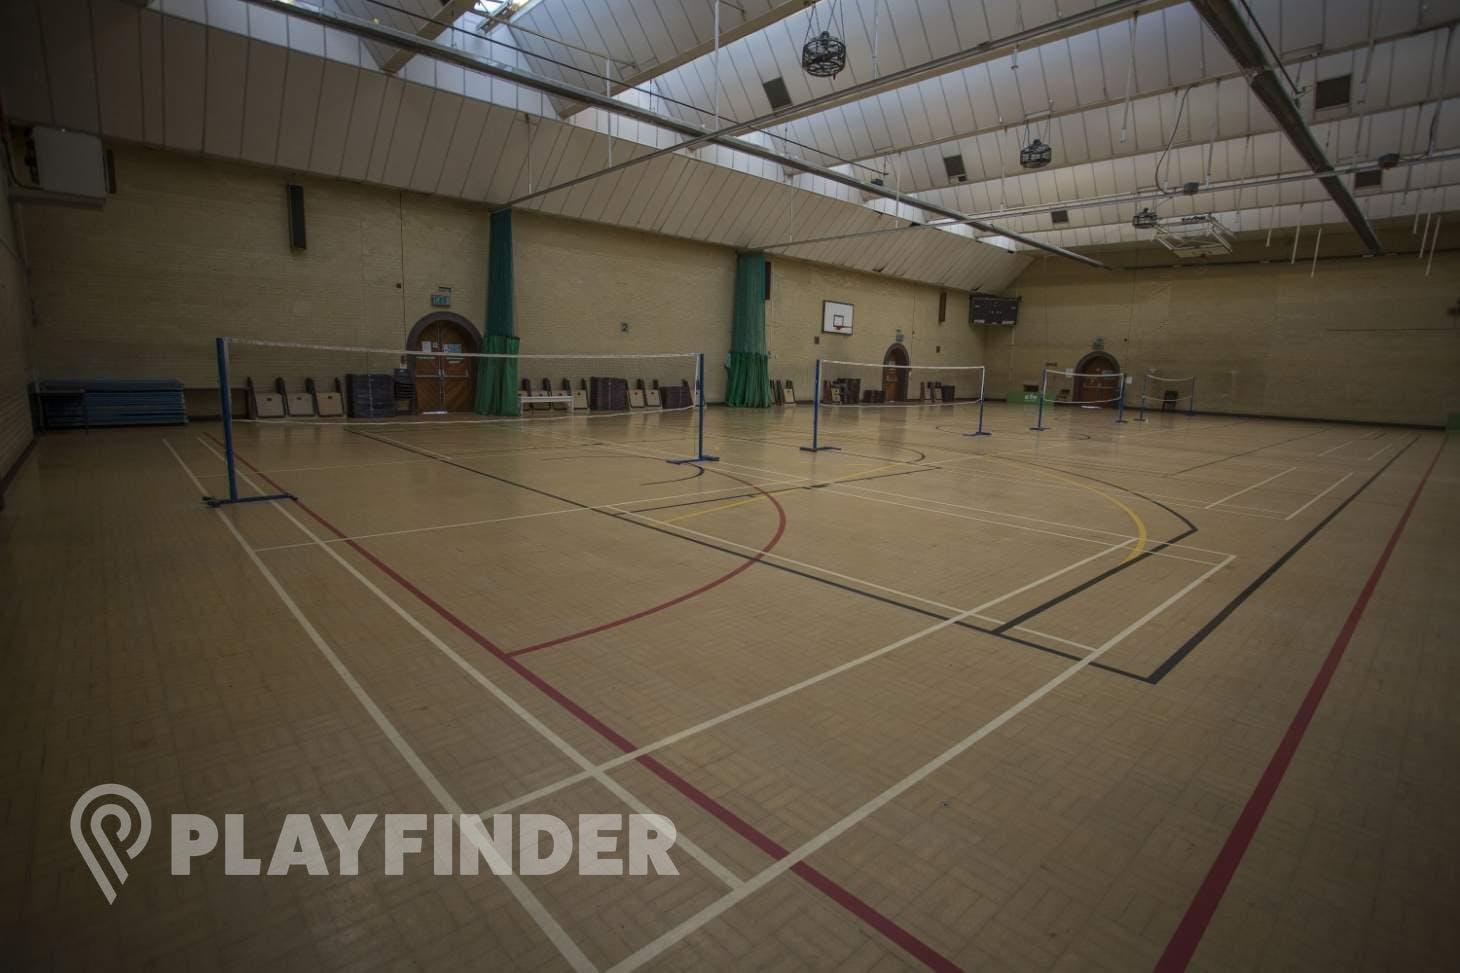 John Orwell Sports Centre Indoor basketball court